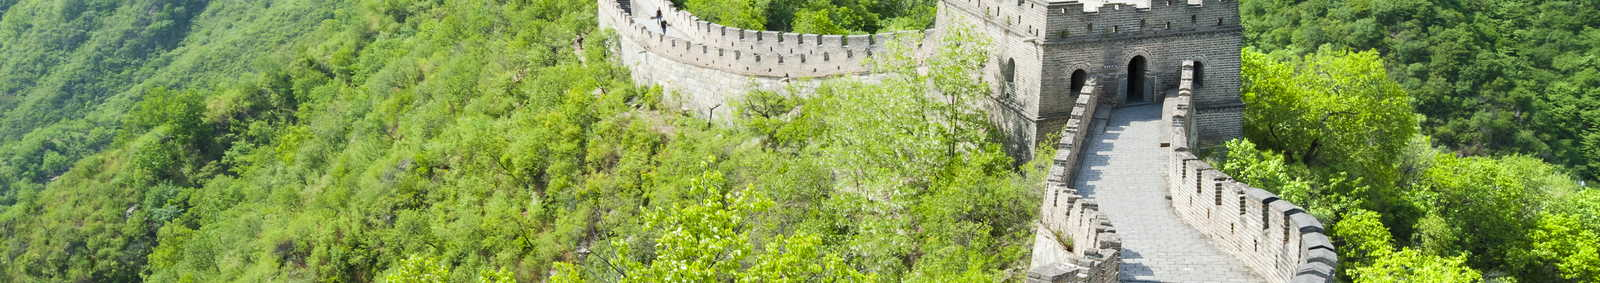 Great Wall of China in Summer, China